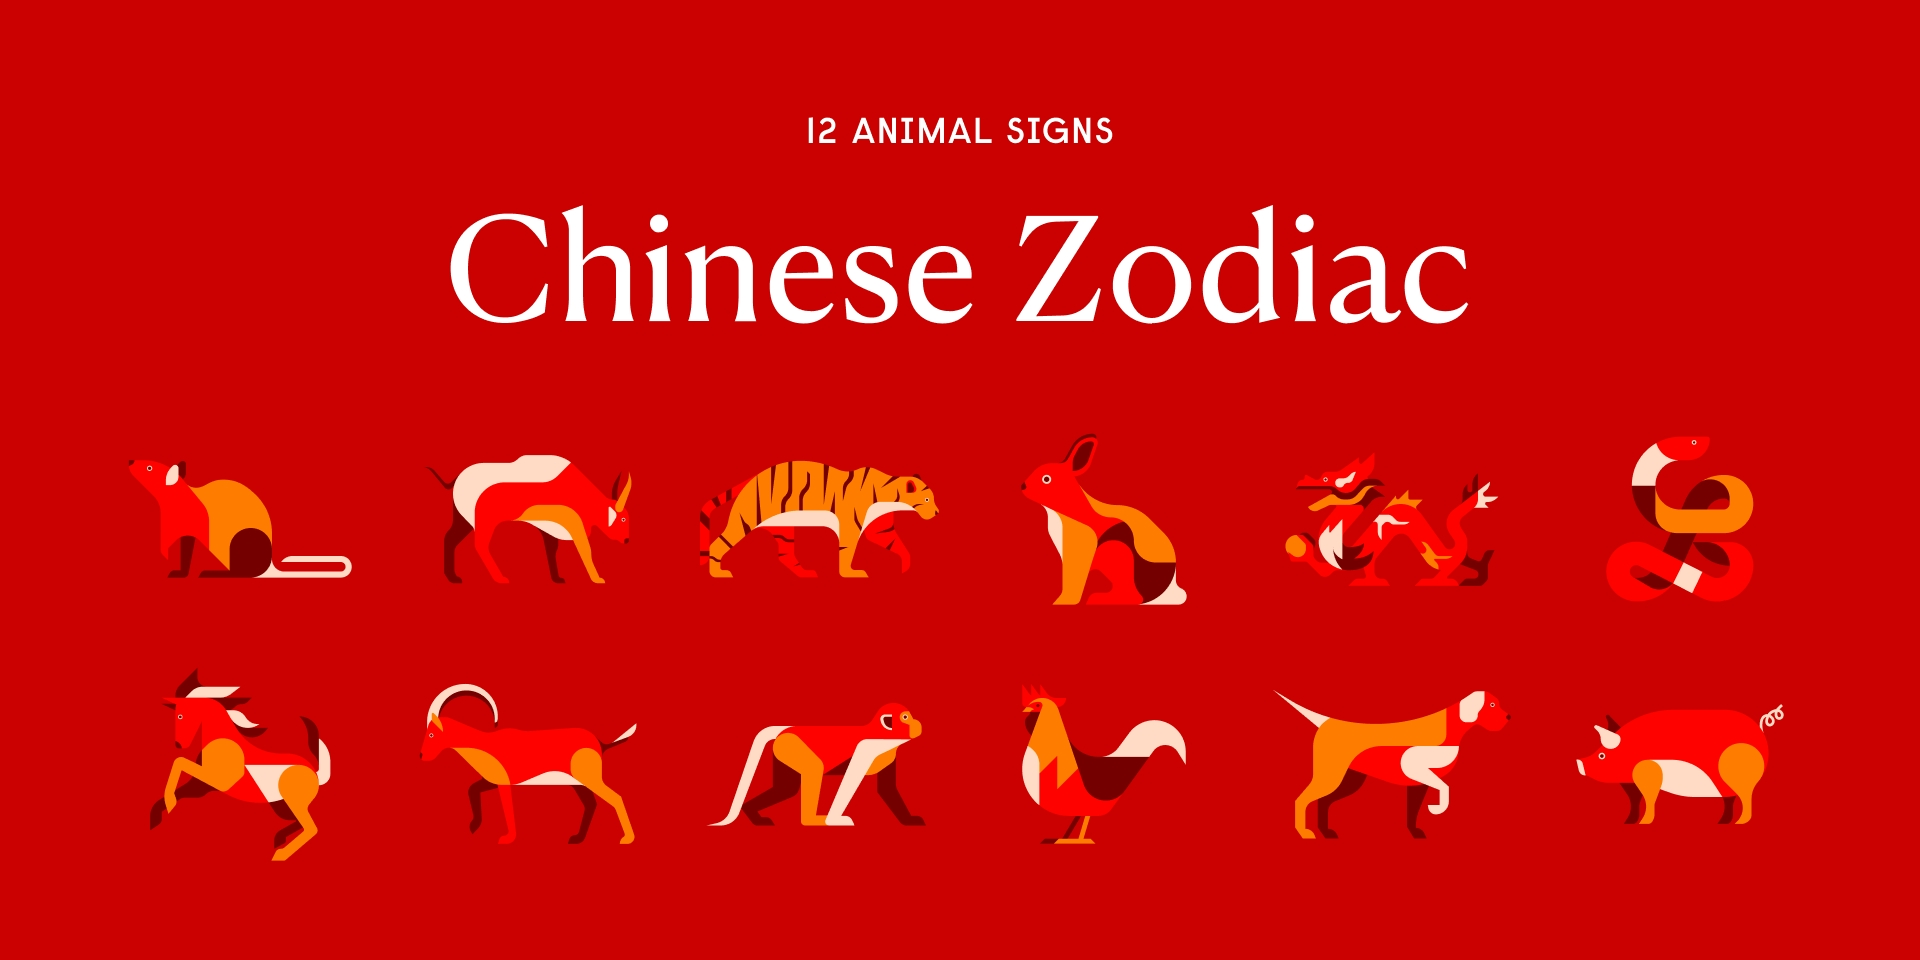 Chinese Zodiac: 12 Animal Signs, Compatibility, Horoscopes Lunar Calendar Zodiac Signs